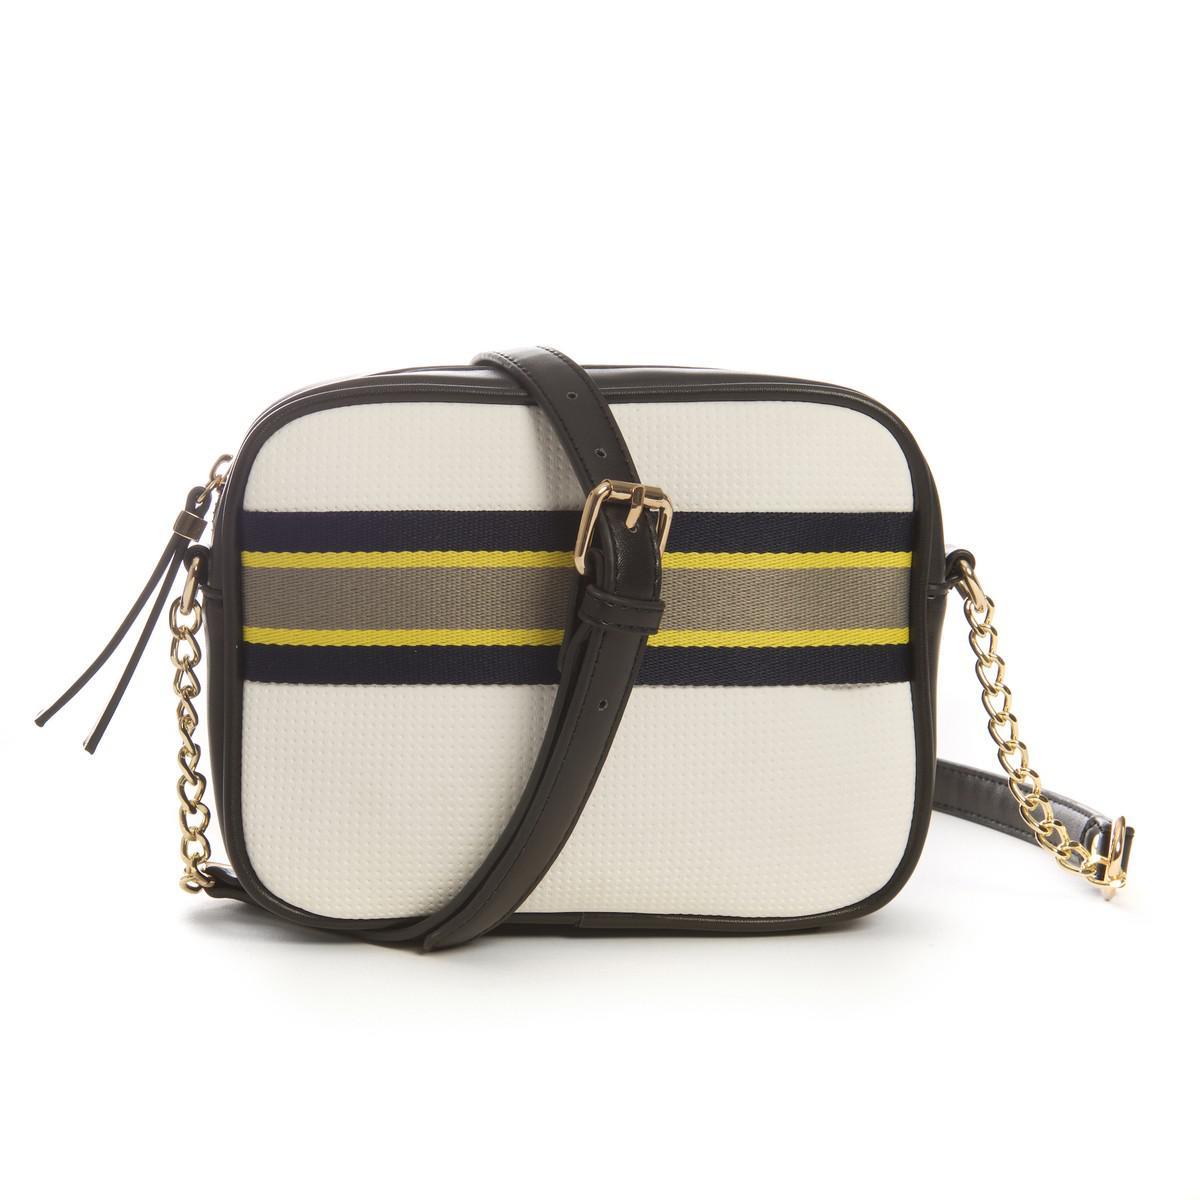 Lyst - La Redoute Sports Bag in Black d7a0285831eca